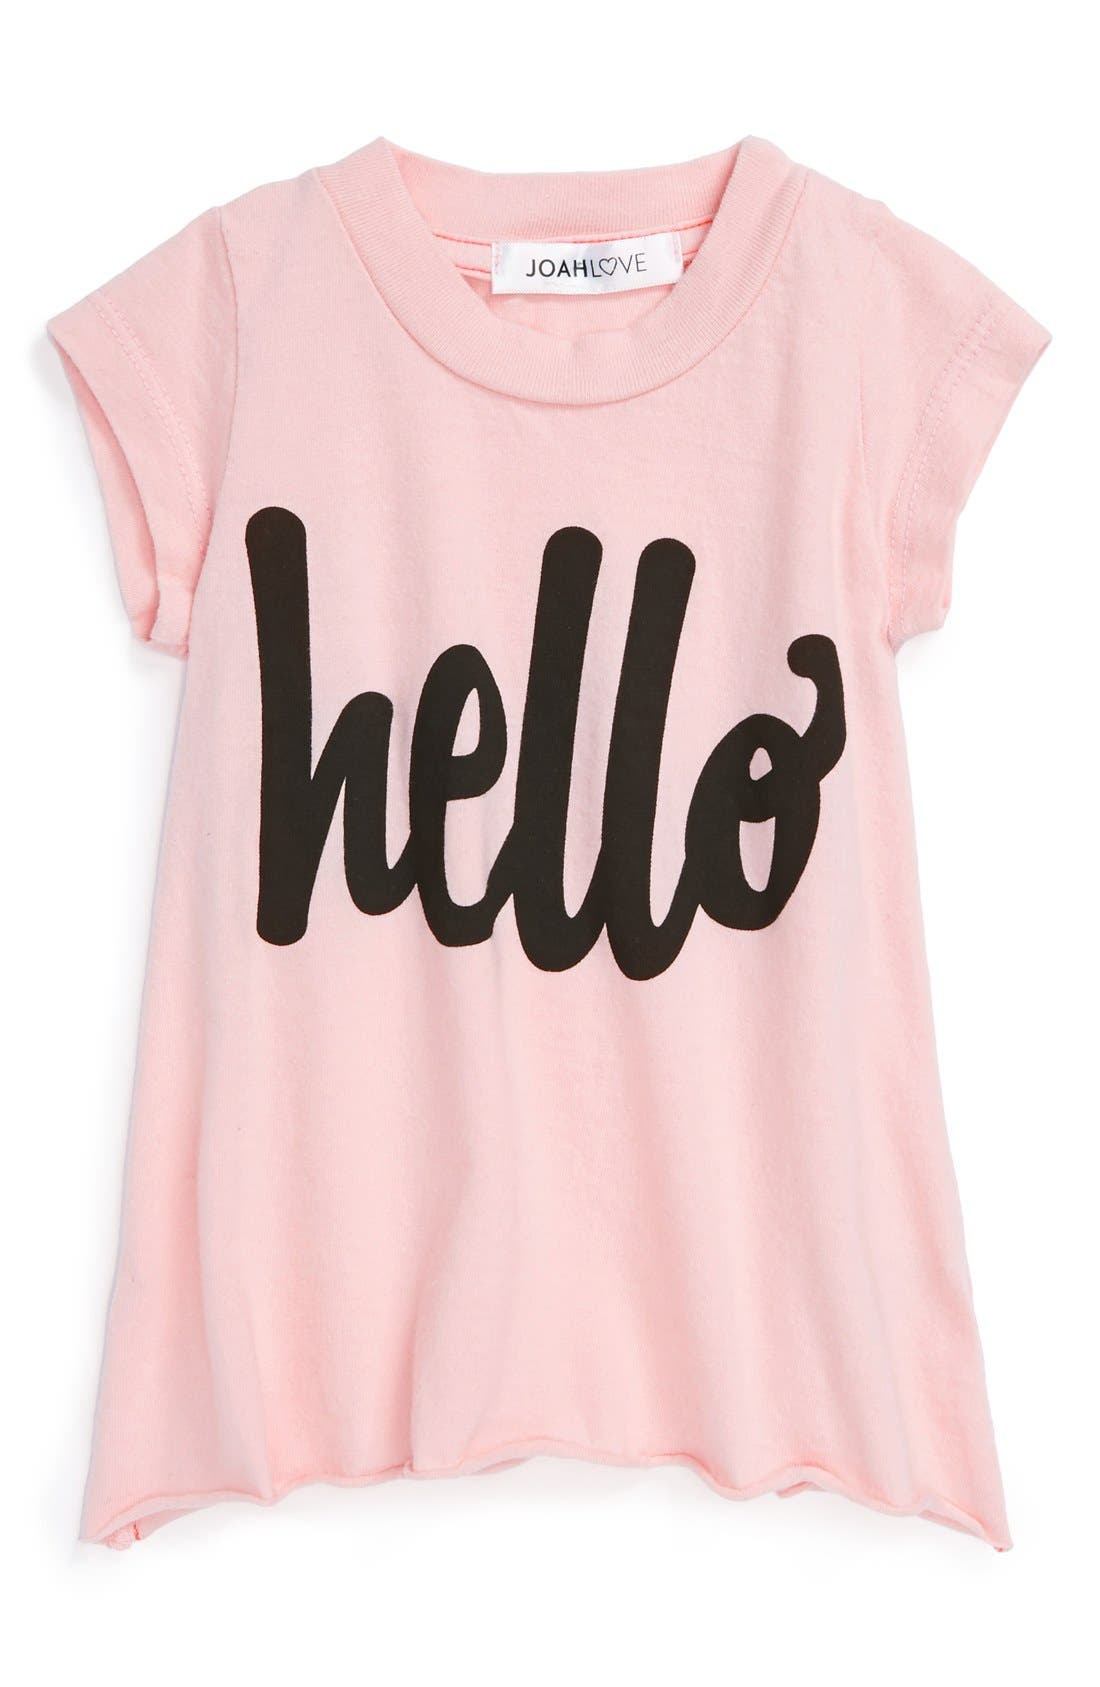 Alternate Image 1 Selected - Joah Love 'Hello' Tee (Baby Girls)